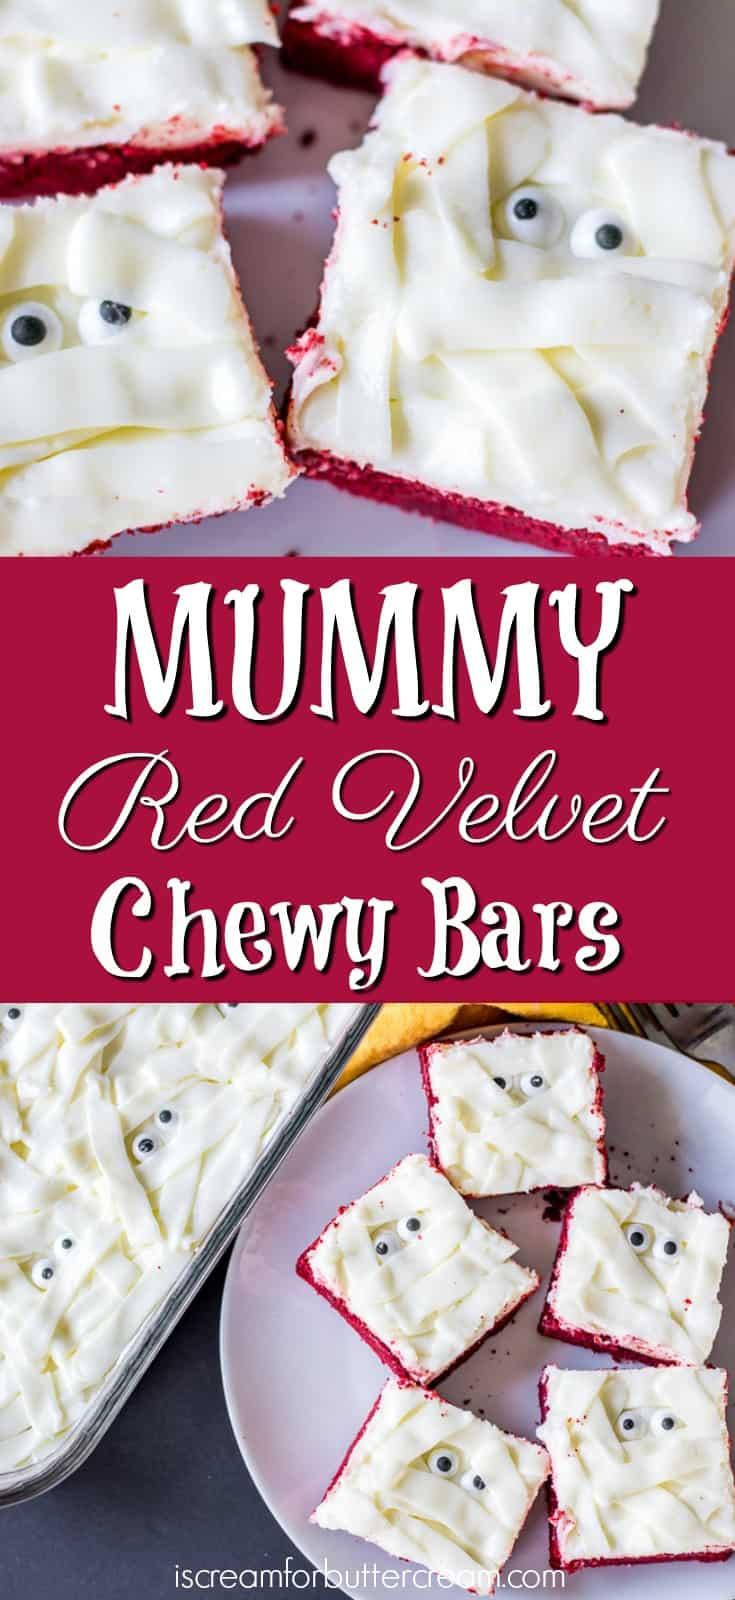 Mummy Red Velvet Chewy Bars Pinterest Graphic